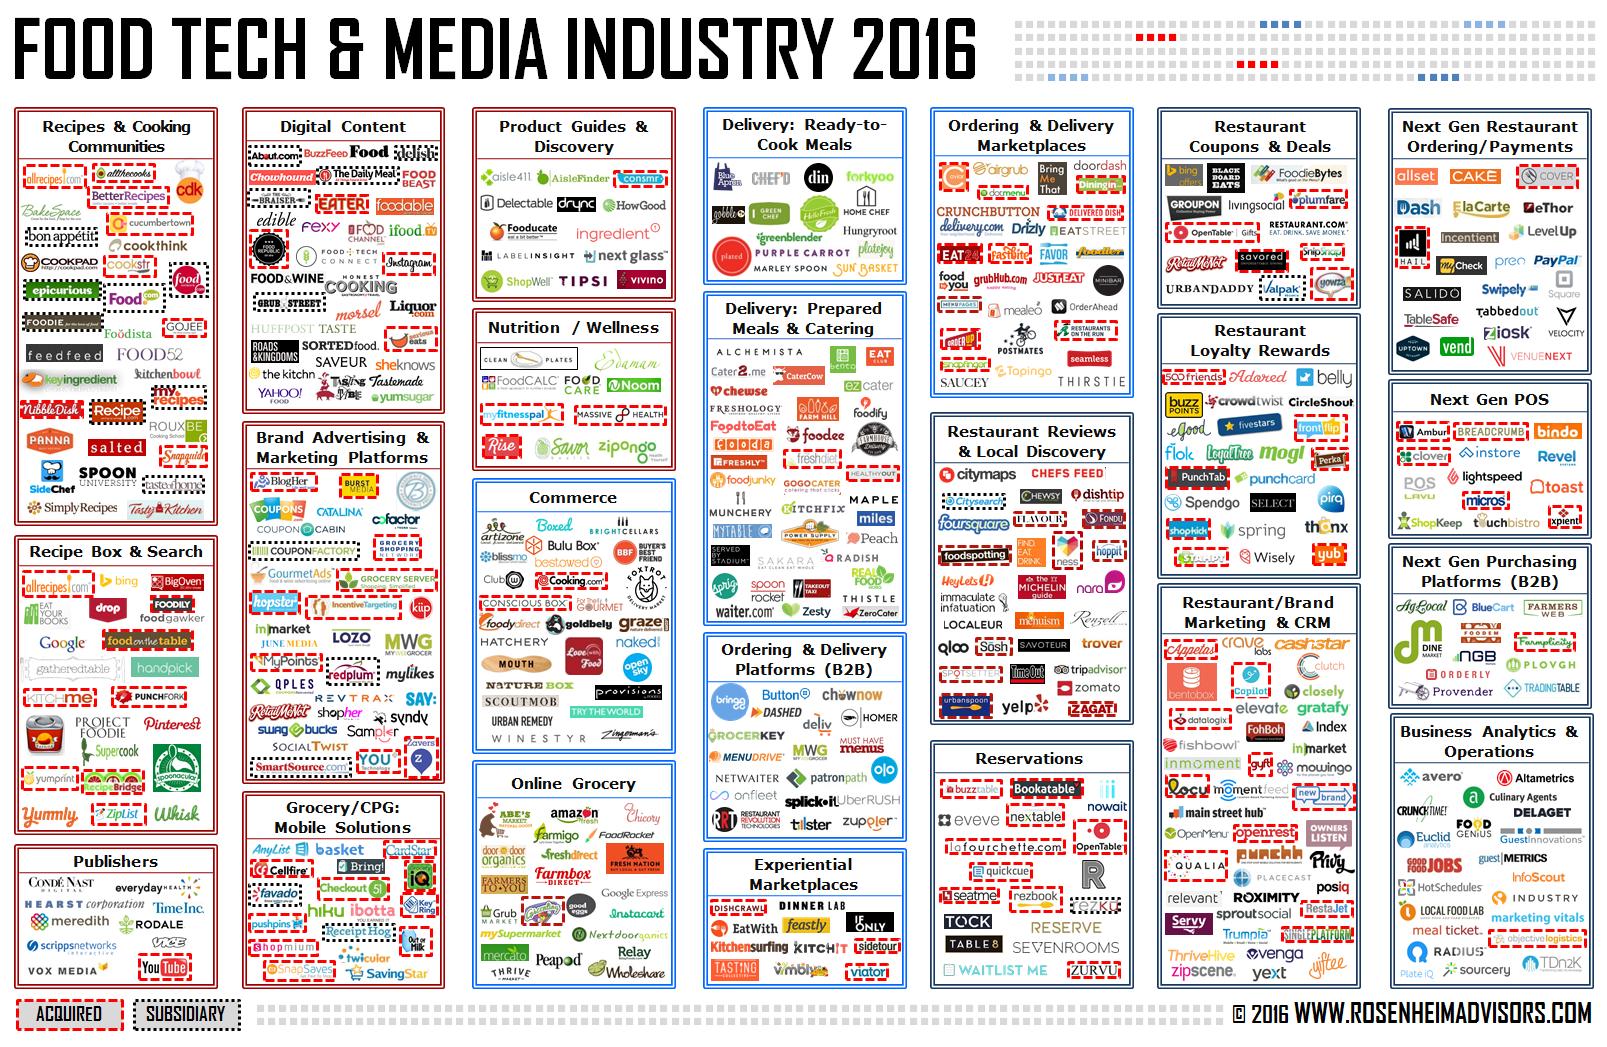 Food Tech & Media Industry 2016